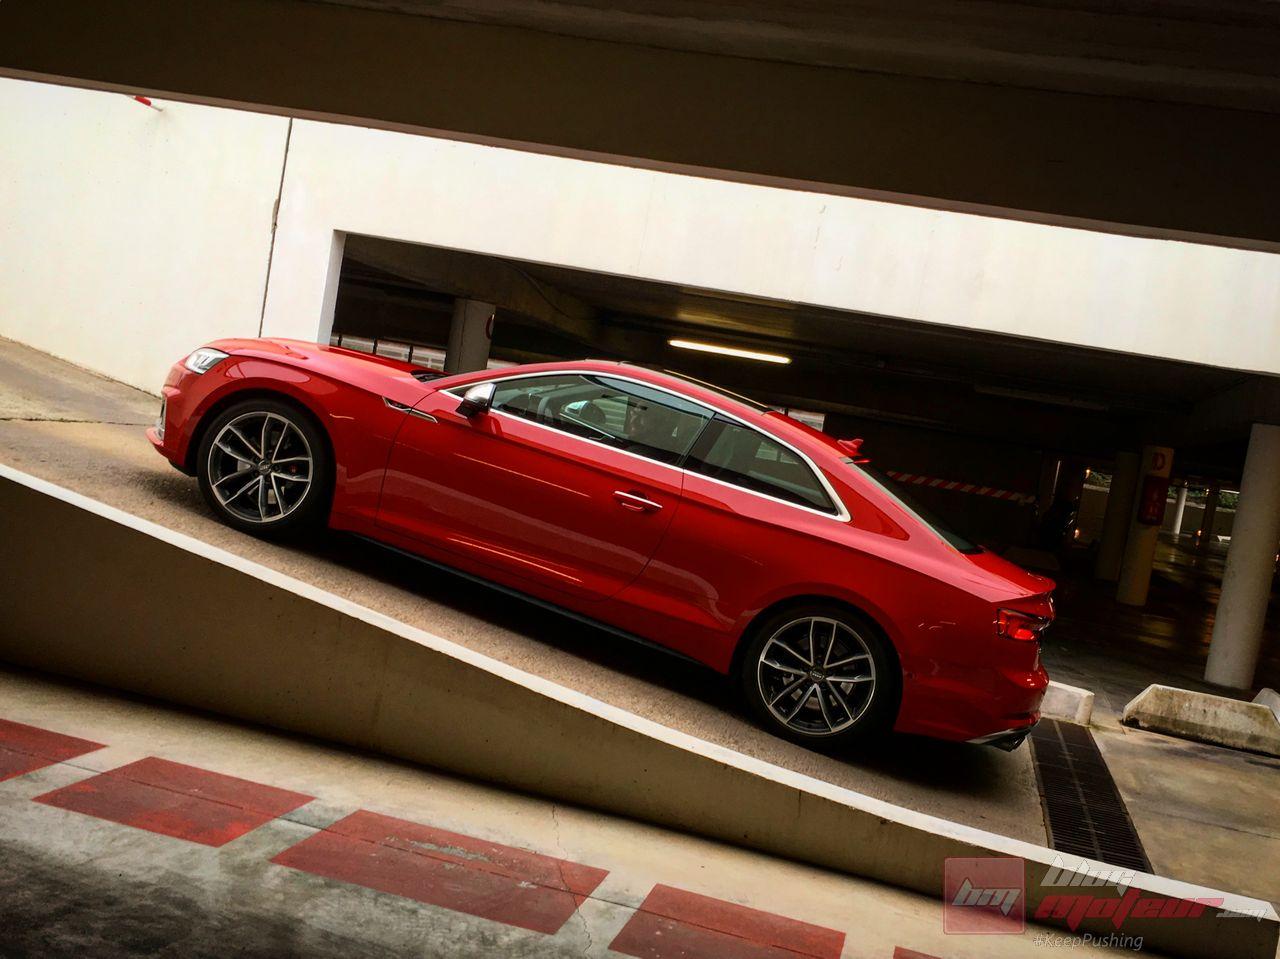 Audi_A5_S5-29